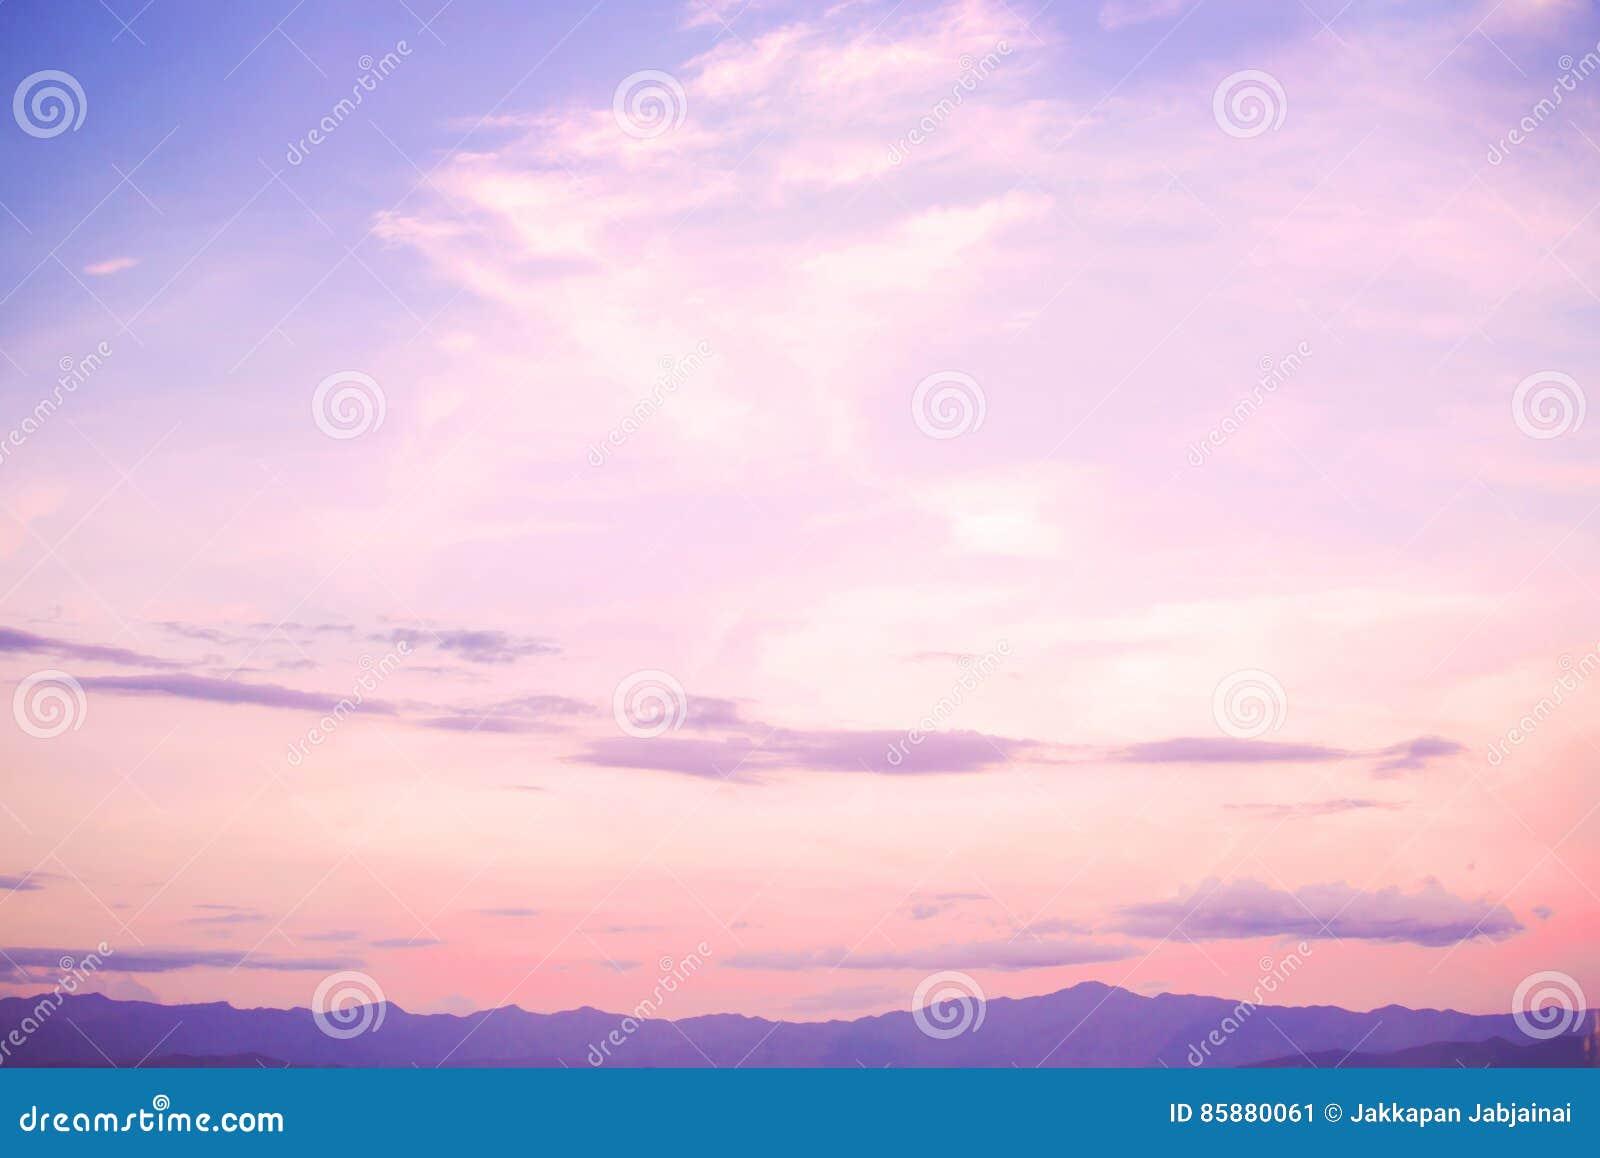 Beautiful Landscape Serenity And Rose Quartz Color Filter Stock